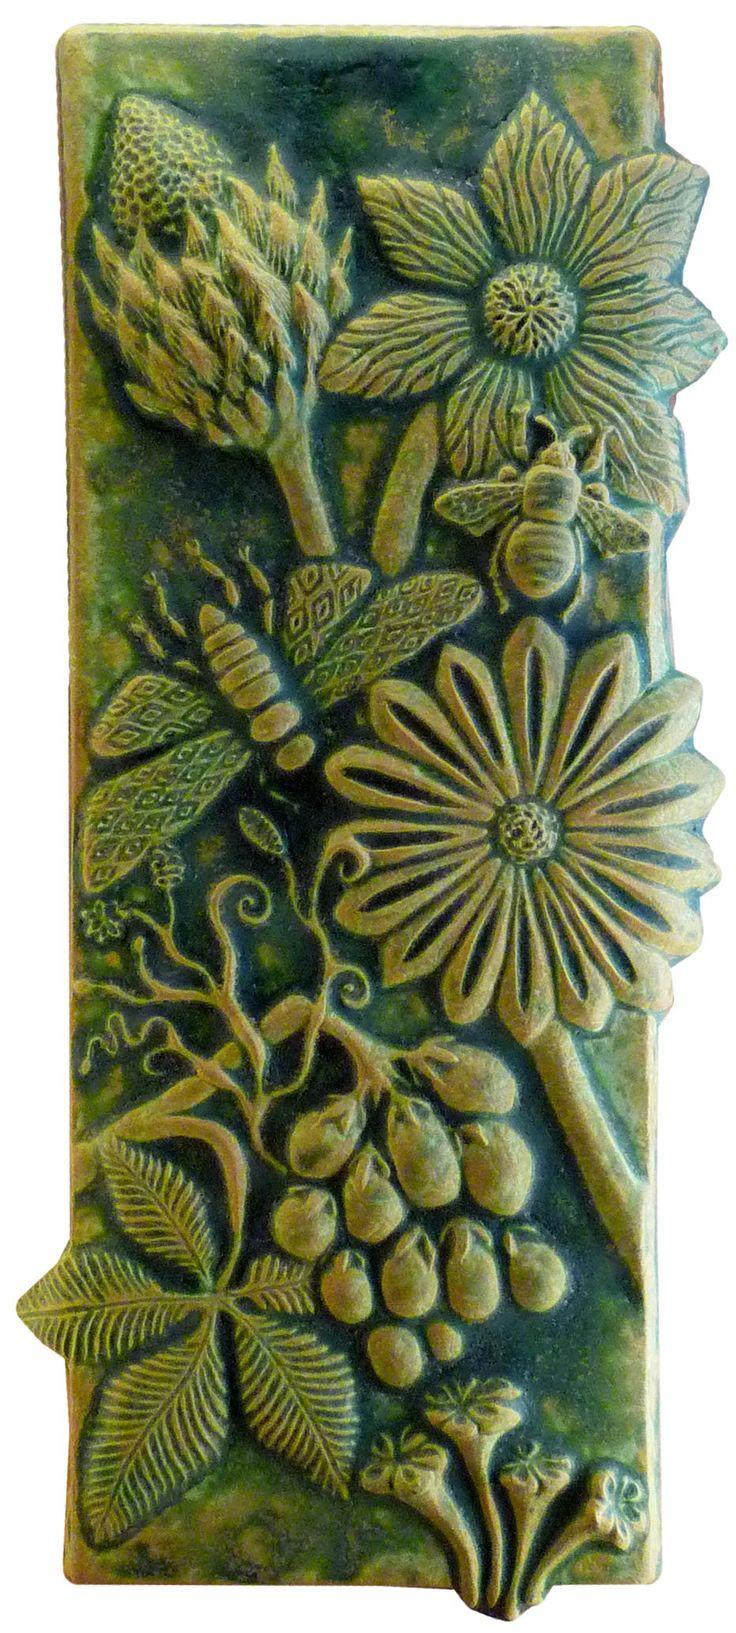 """Botanical & Bugs Ceramic Tile in Green Ochre"" Ceramic Wall Art Created by Beth Sherman"